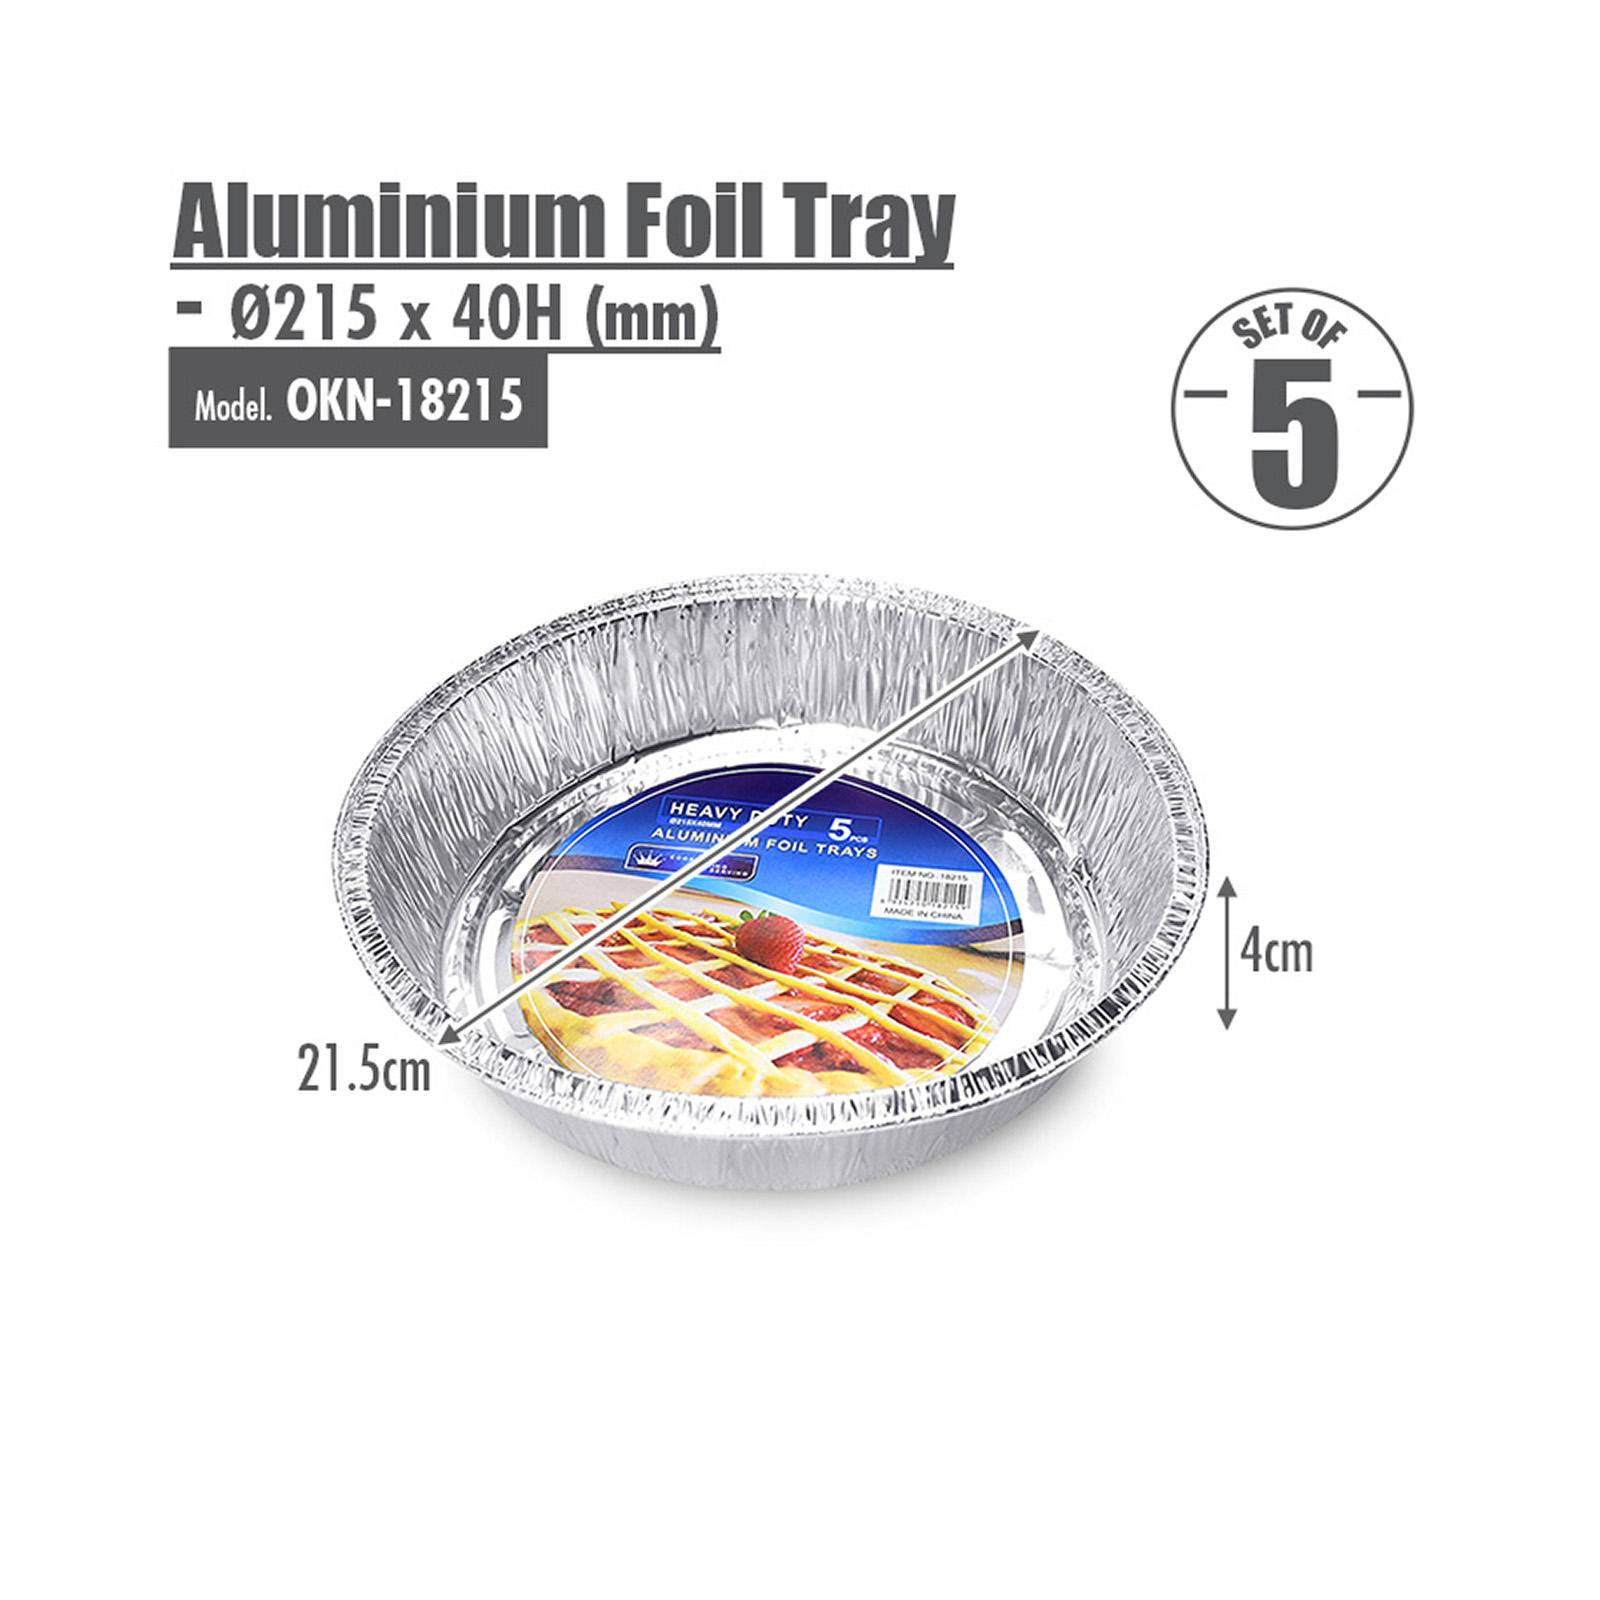 HOUZE Round Aluminium Foil Tray - Set of 5